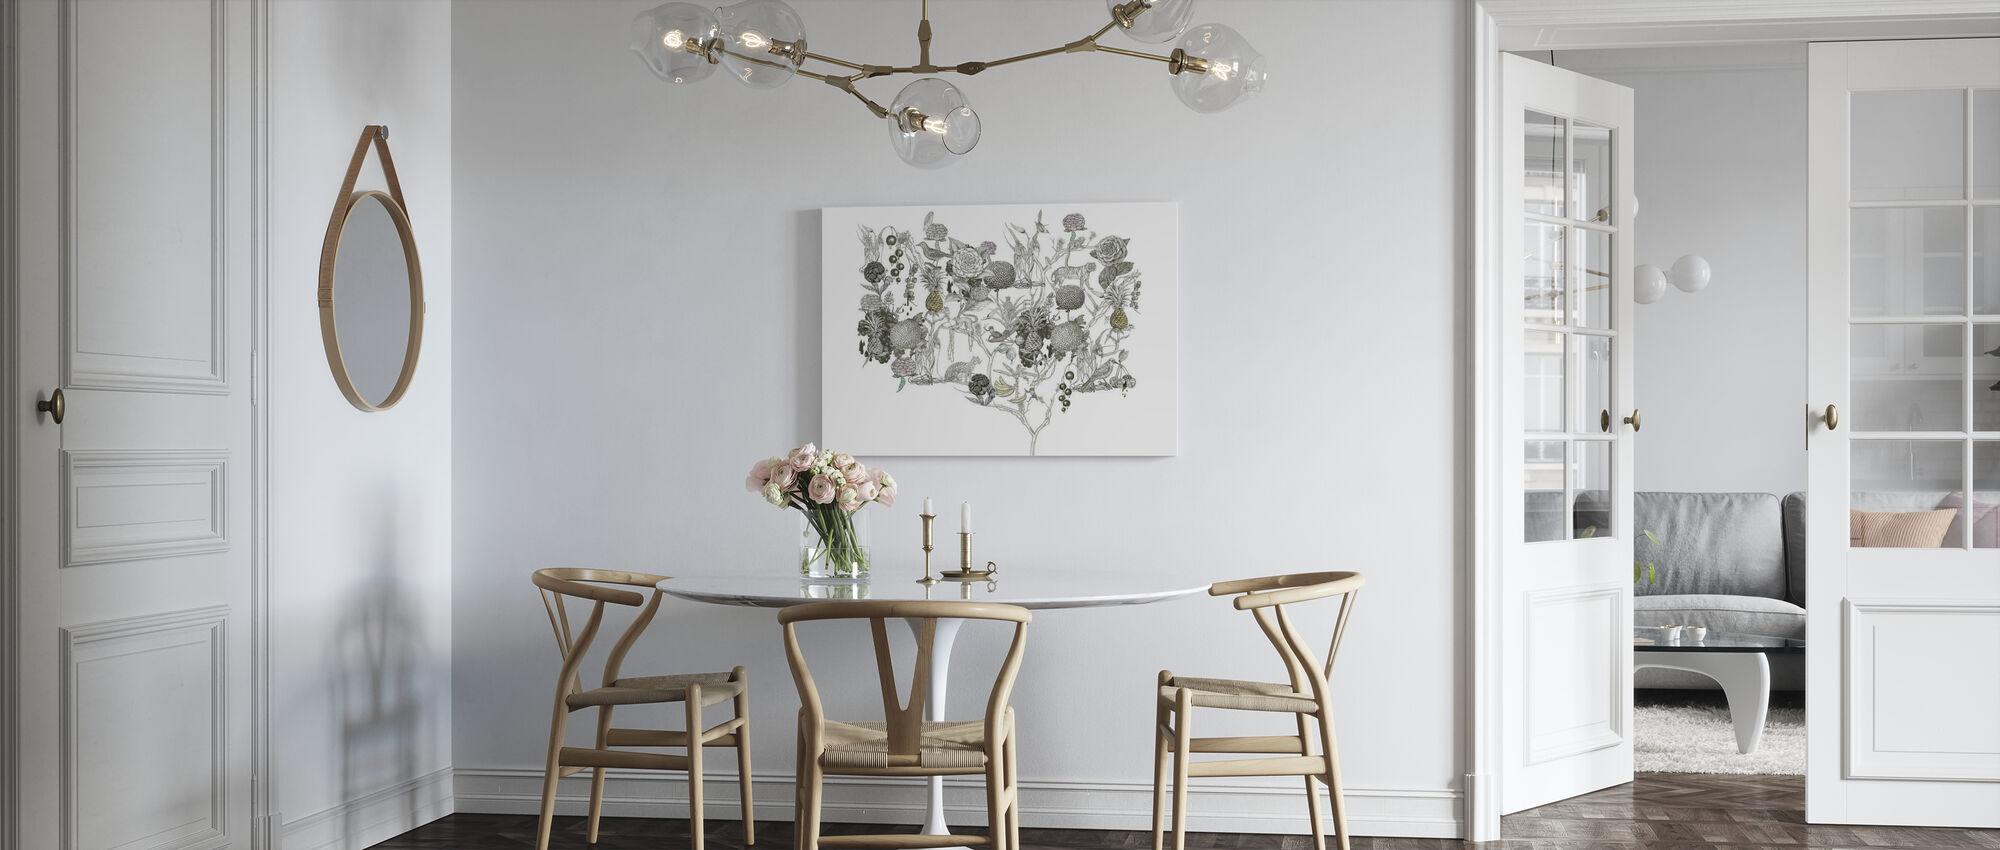 Wild at Heart 4 - Canvas print - Kitchen